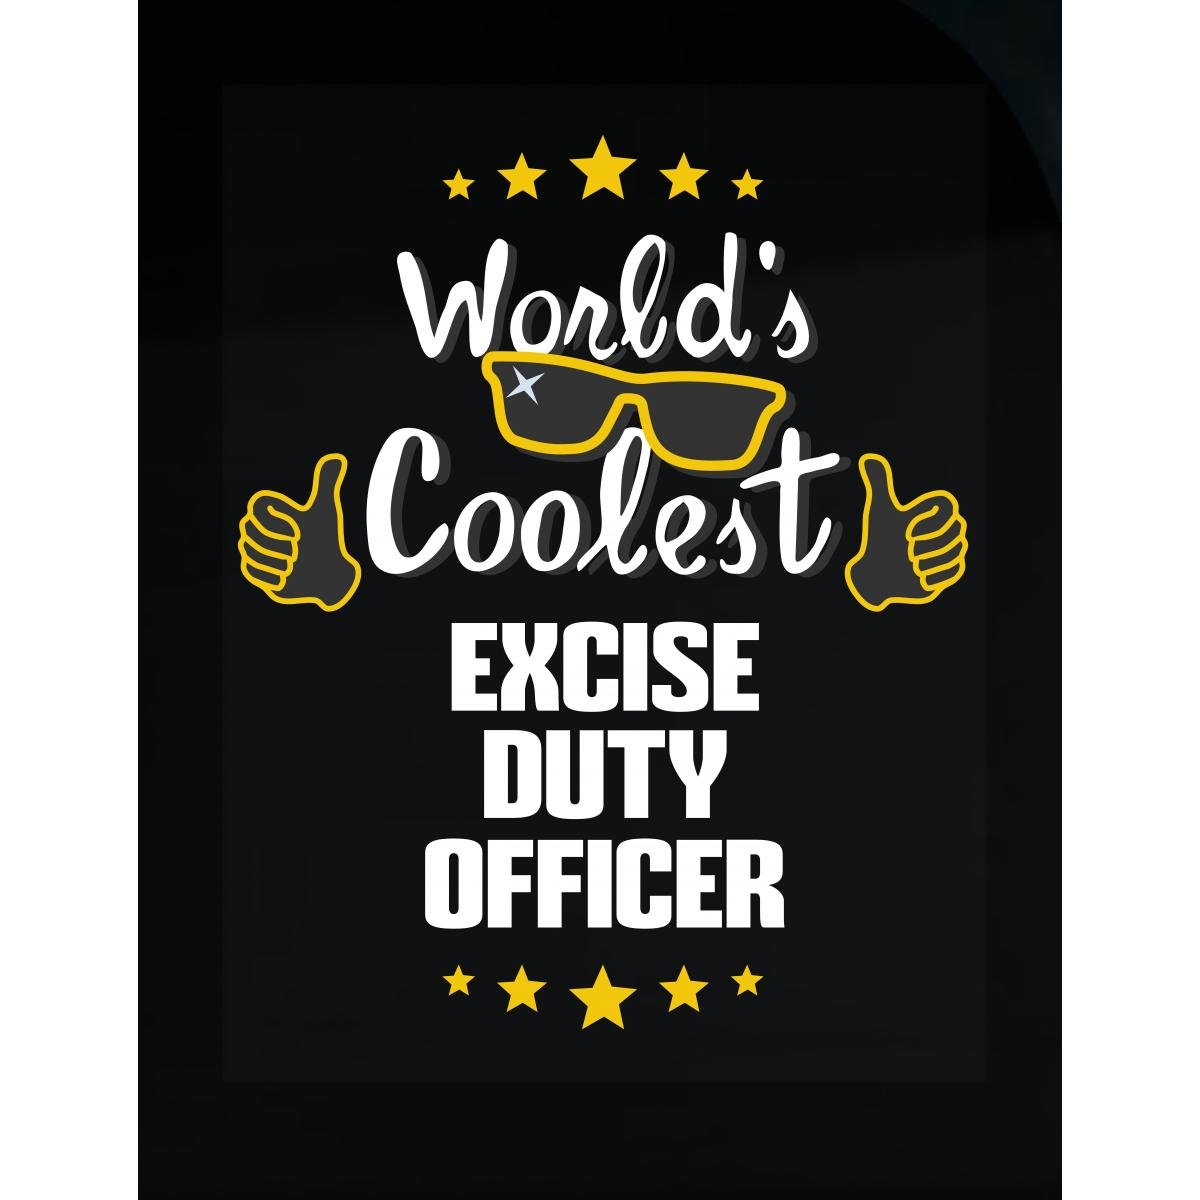 World's Coolest Excise Duty Officer - Sticker